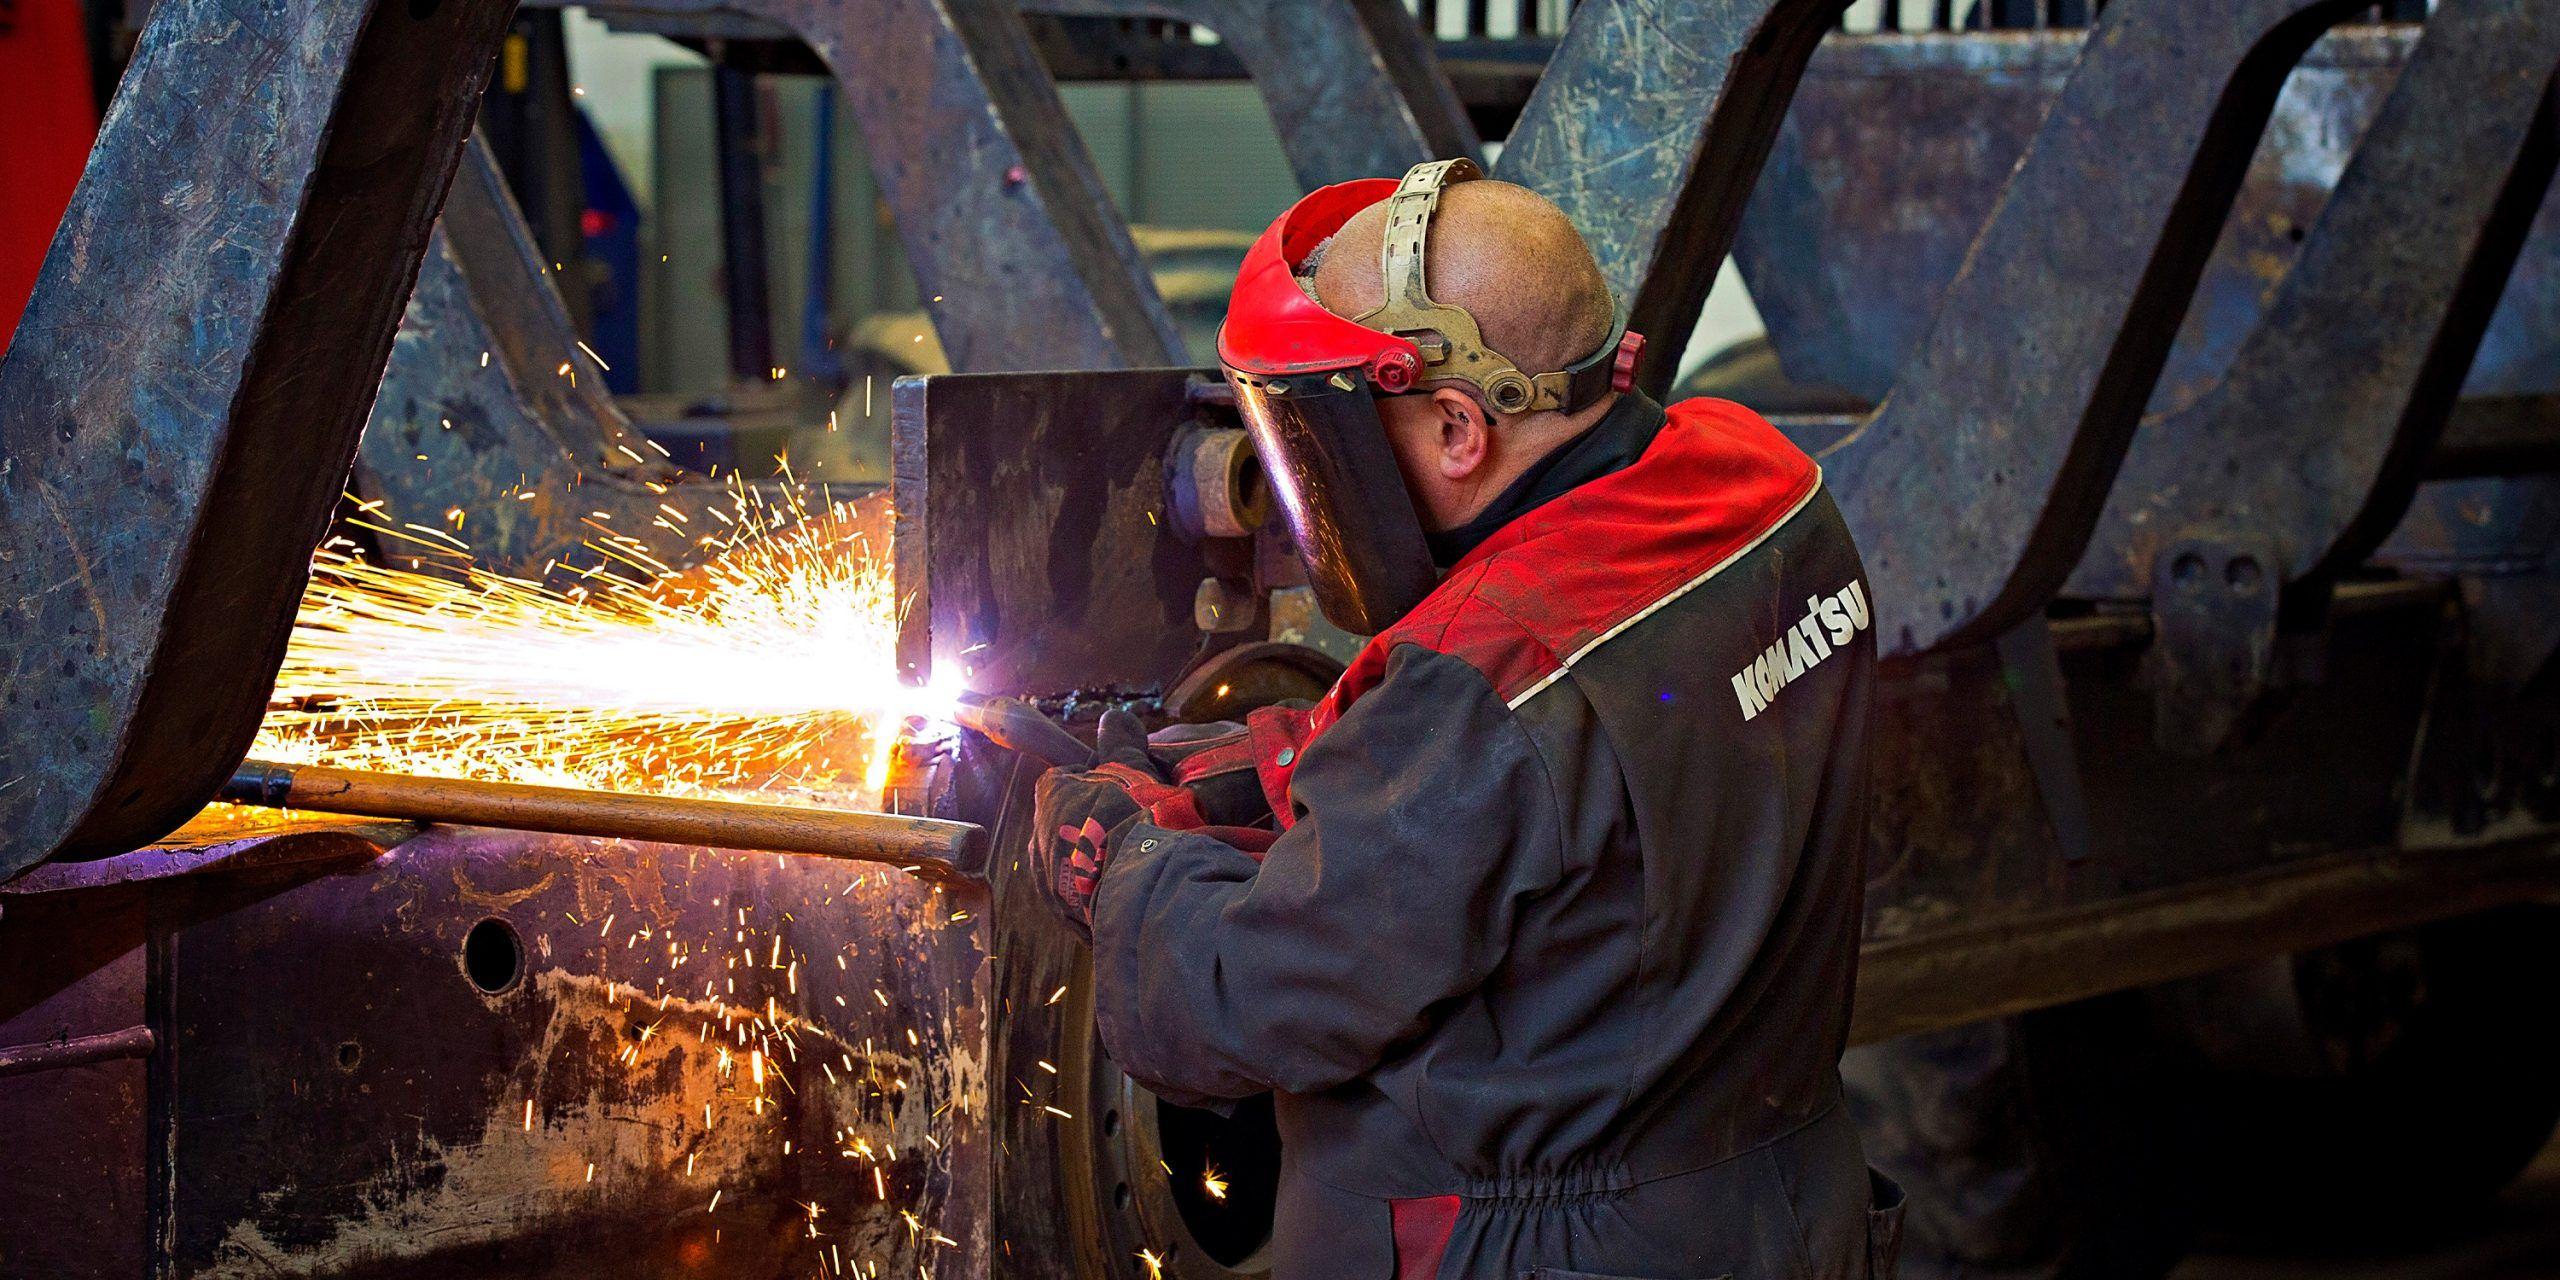 Industry photography within Komatsu factory